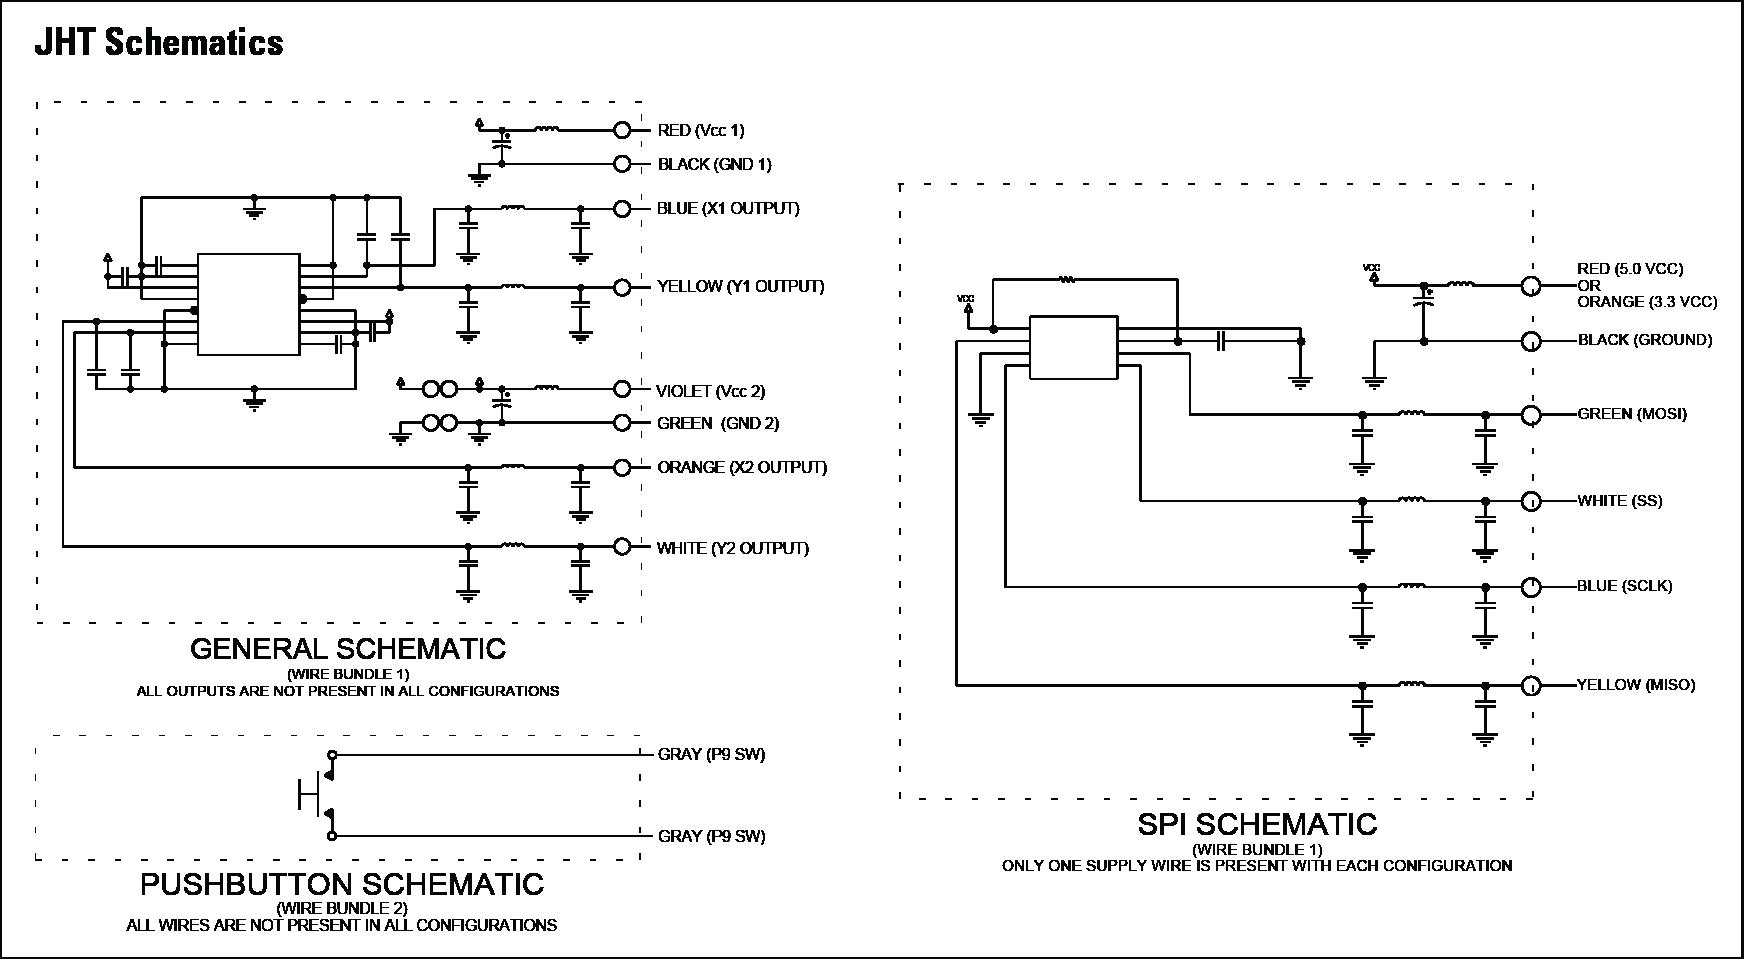 cat th82 joystick wiring diagram explained wiring diagrams  roto mix wiring diagram for joystick wiring diagrams data base power wiring diagram cat th82 joystick wiring diagram